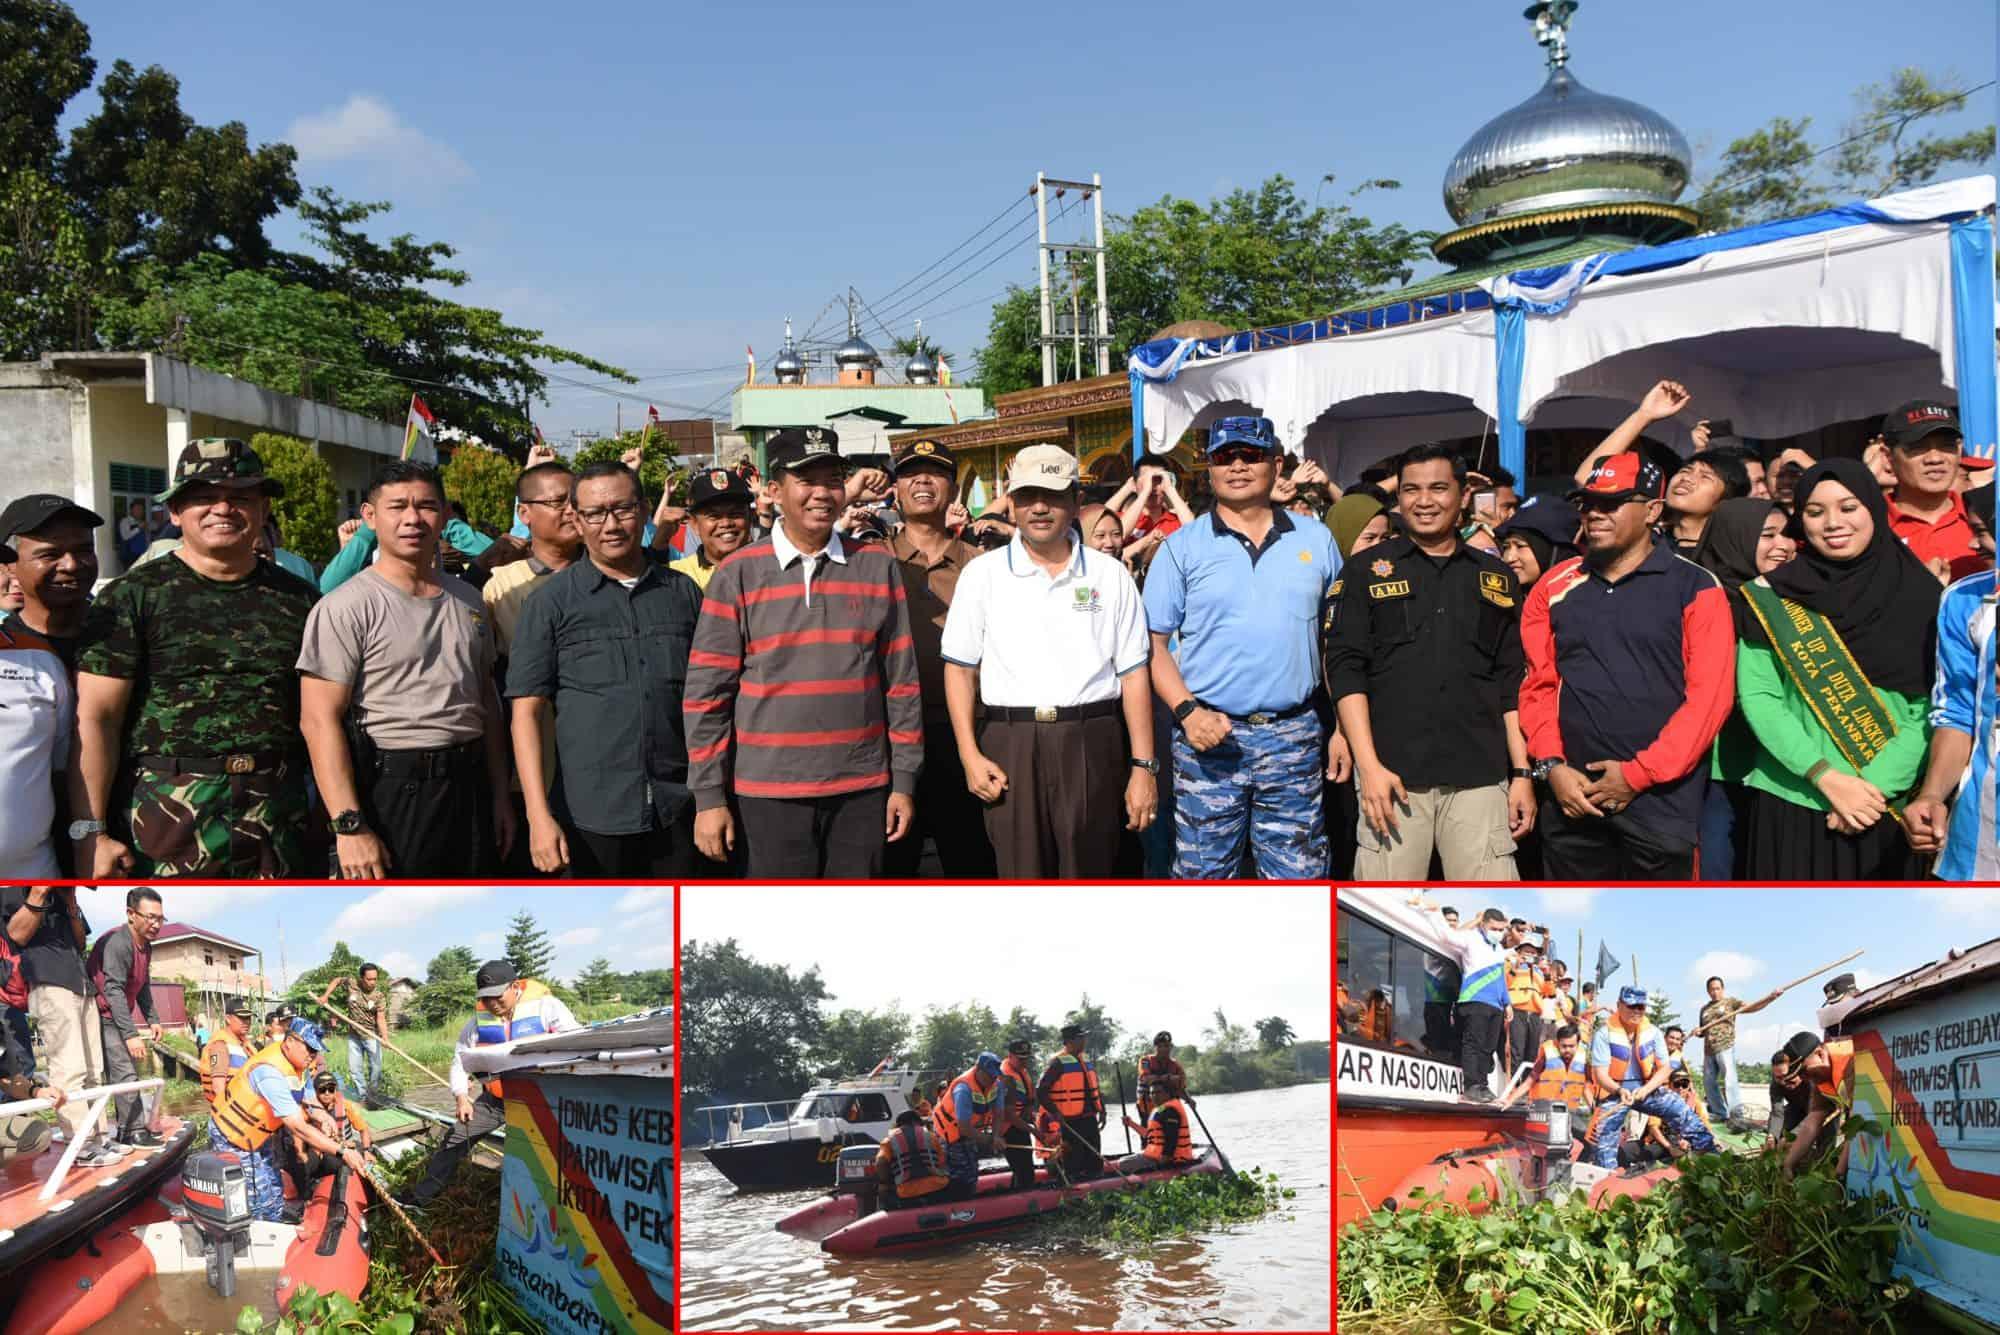 Menyambut Hari Jadi Kota Pekanbaru Danlanud Rsn Bersihkan Sungai Siak